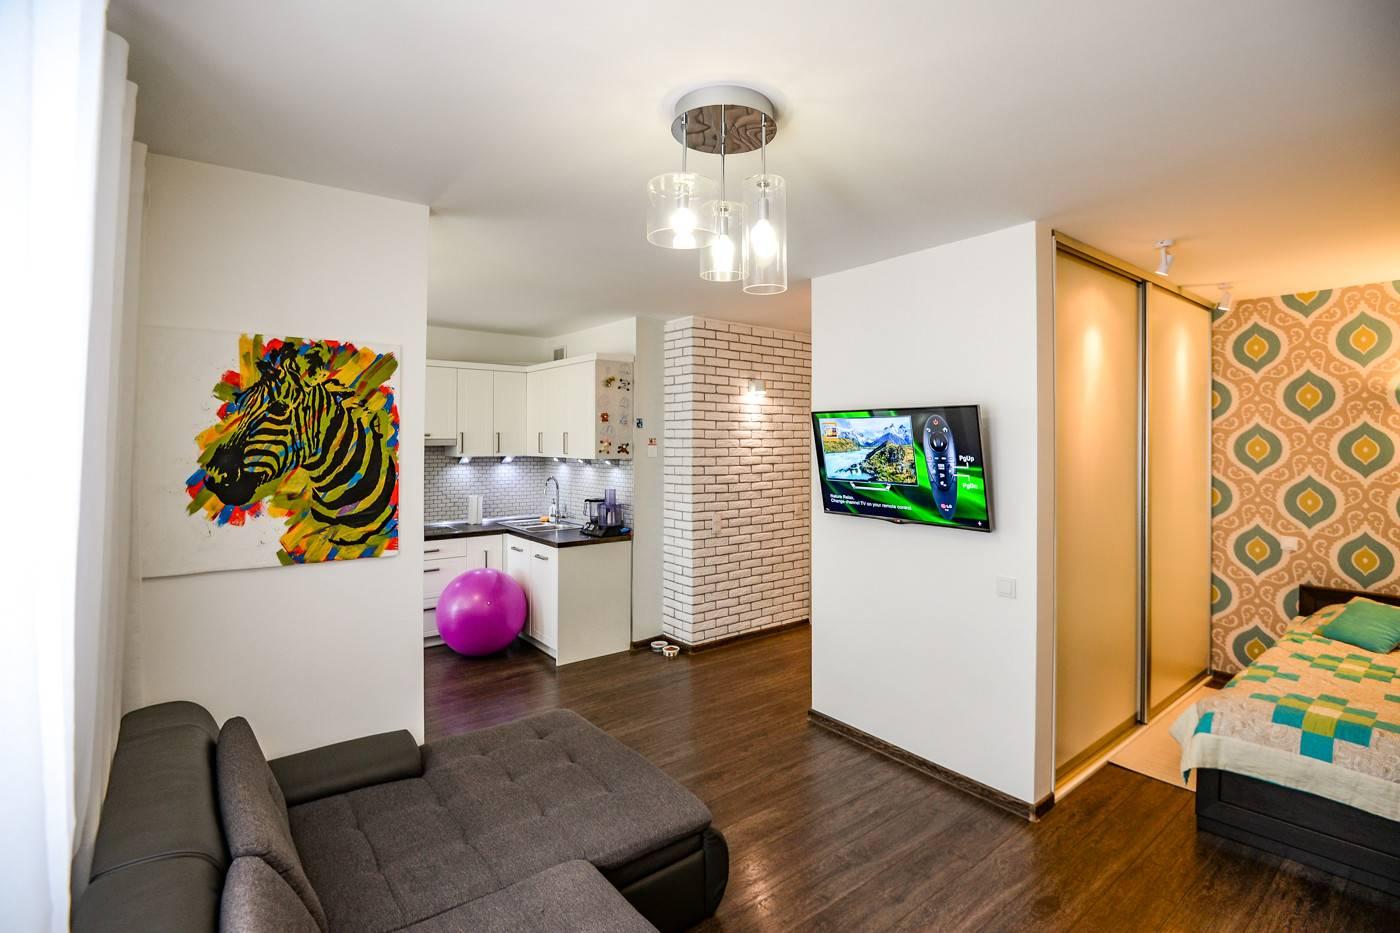 Ремонт однокомнатной квартиры: дизайн + идеи | gd-home.com